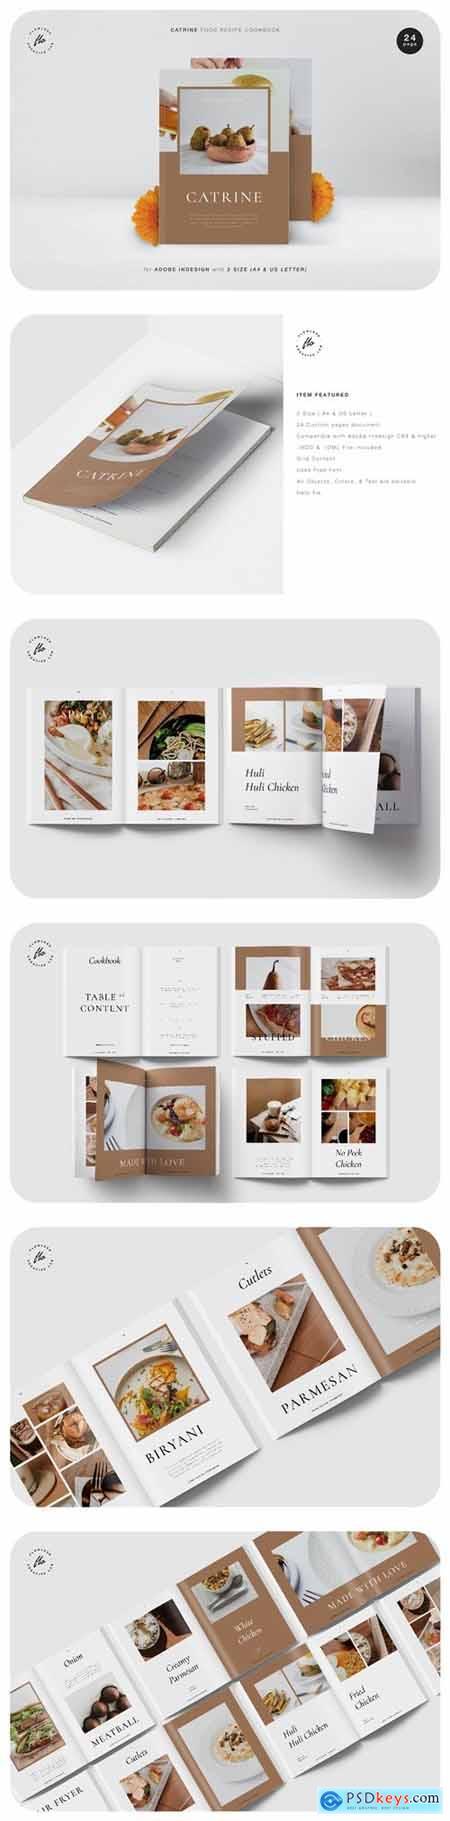 Catrine Food Recipe Cookbook